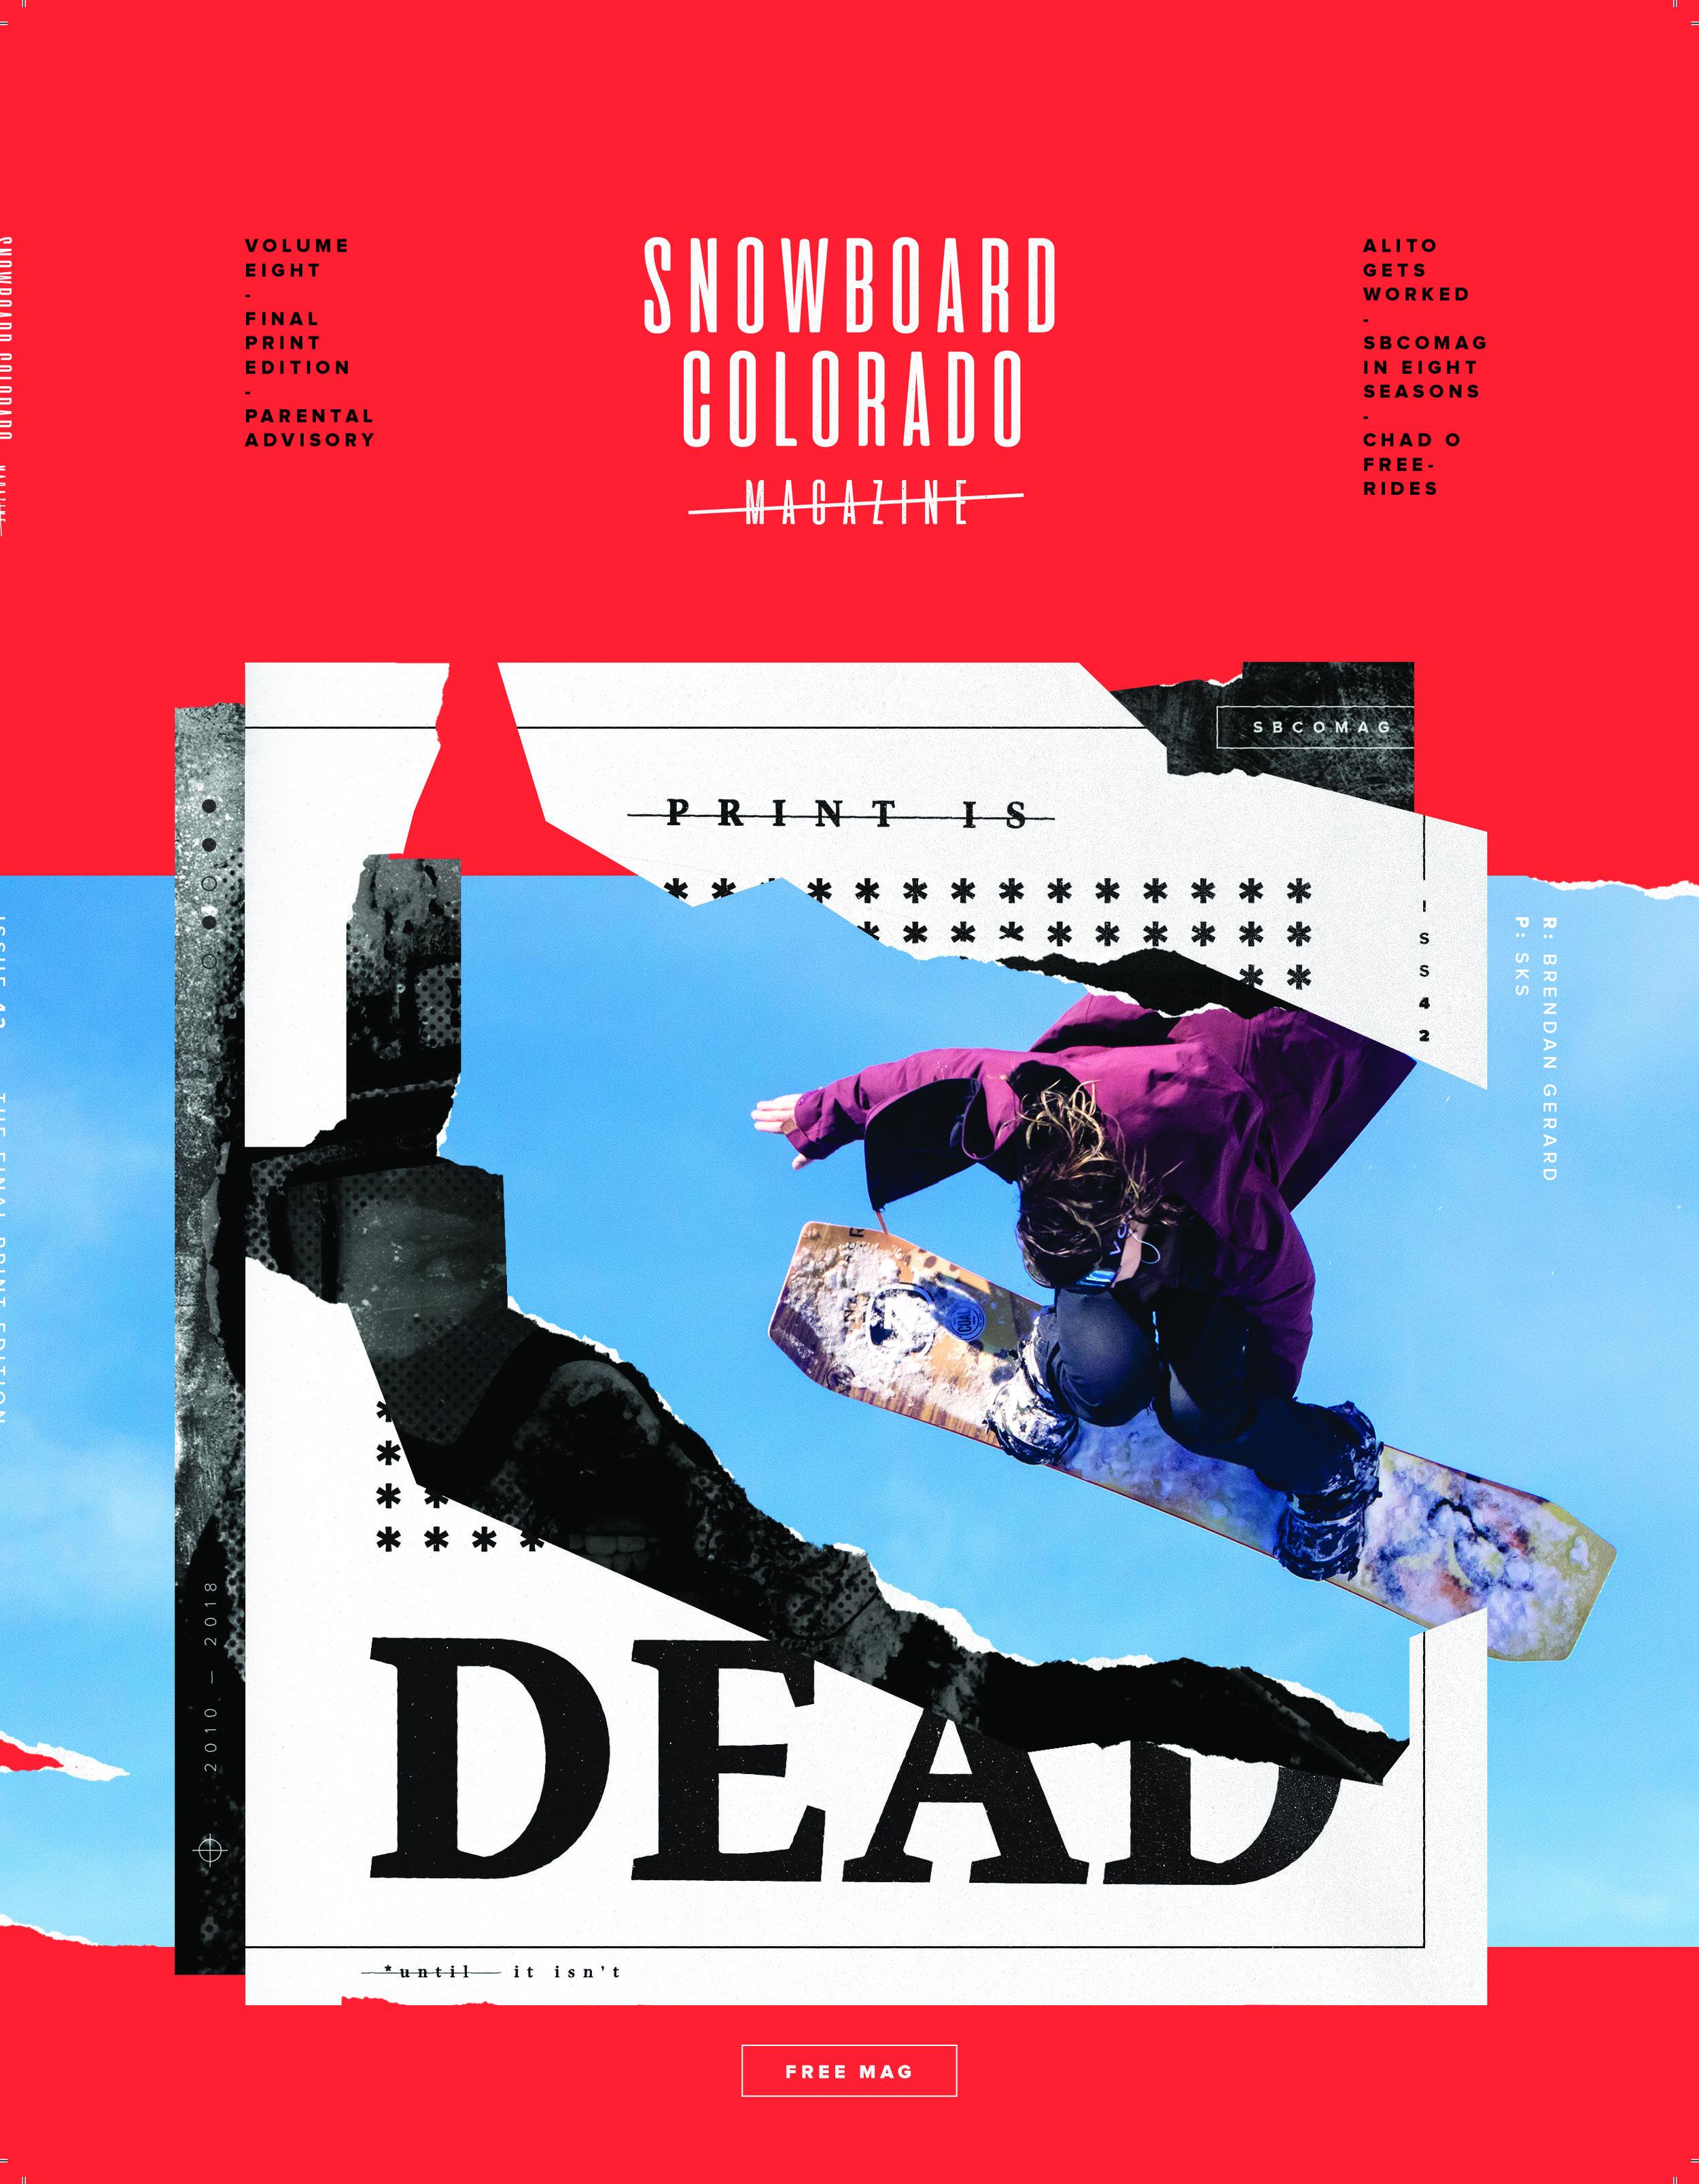 Snowboard Colorado Covershot.jpg